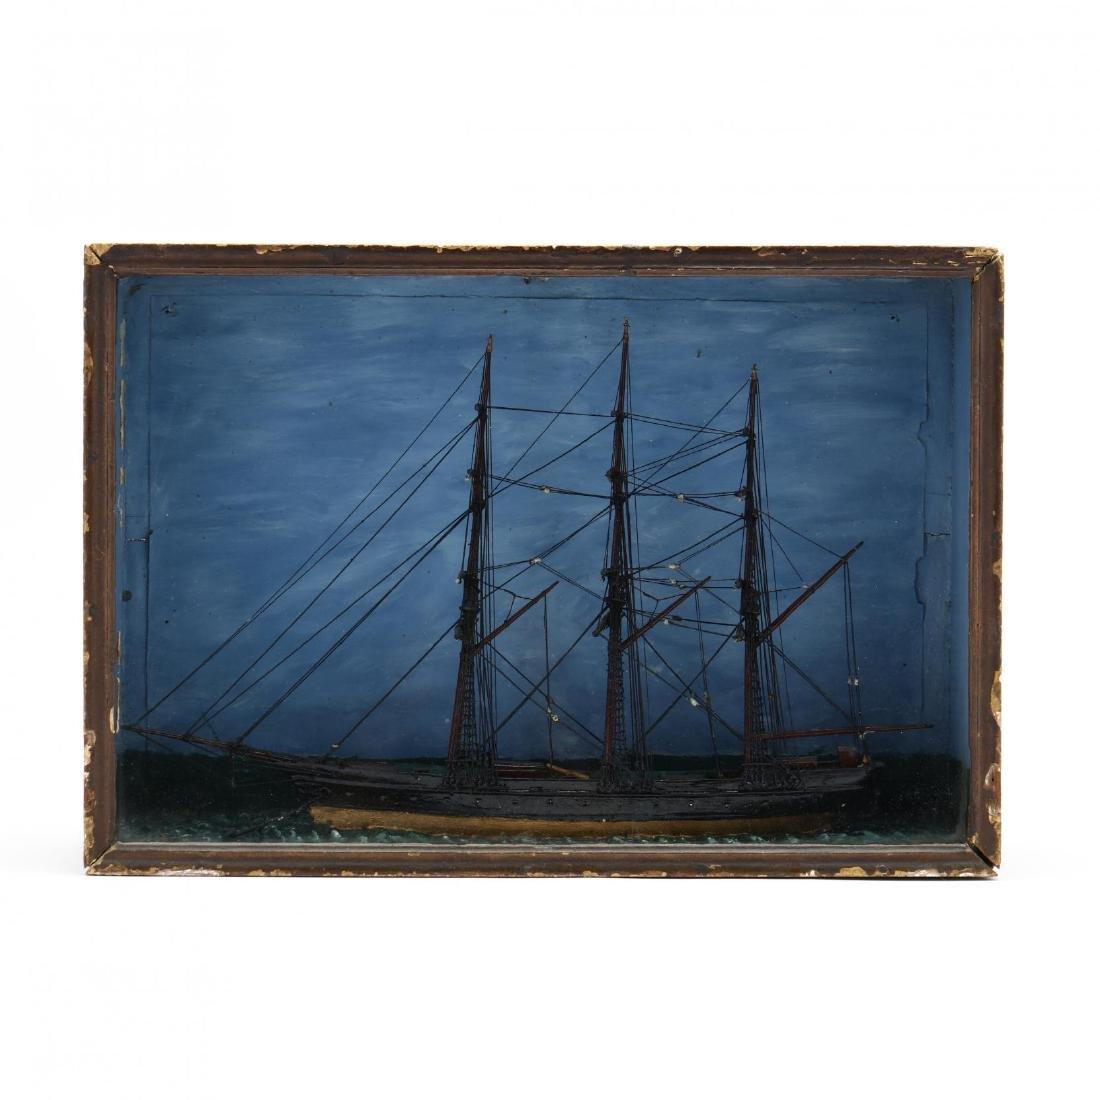 Nautical Diorama of a Full-Rigged Ship